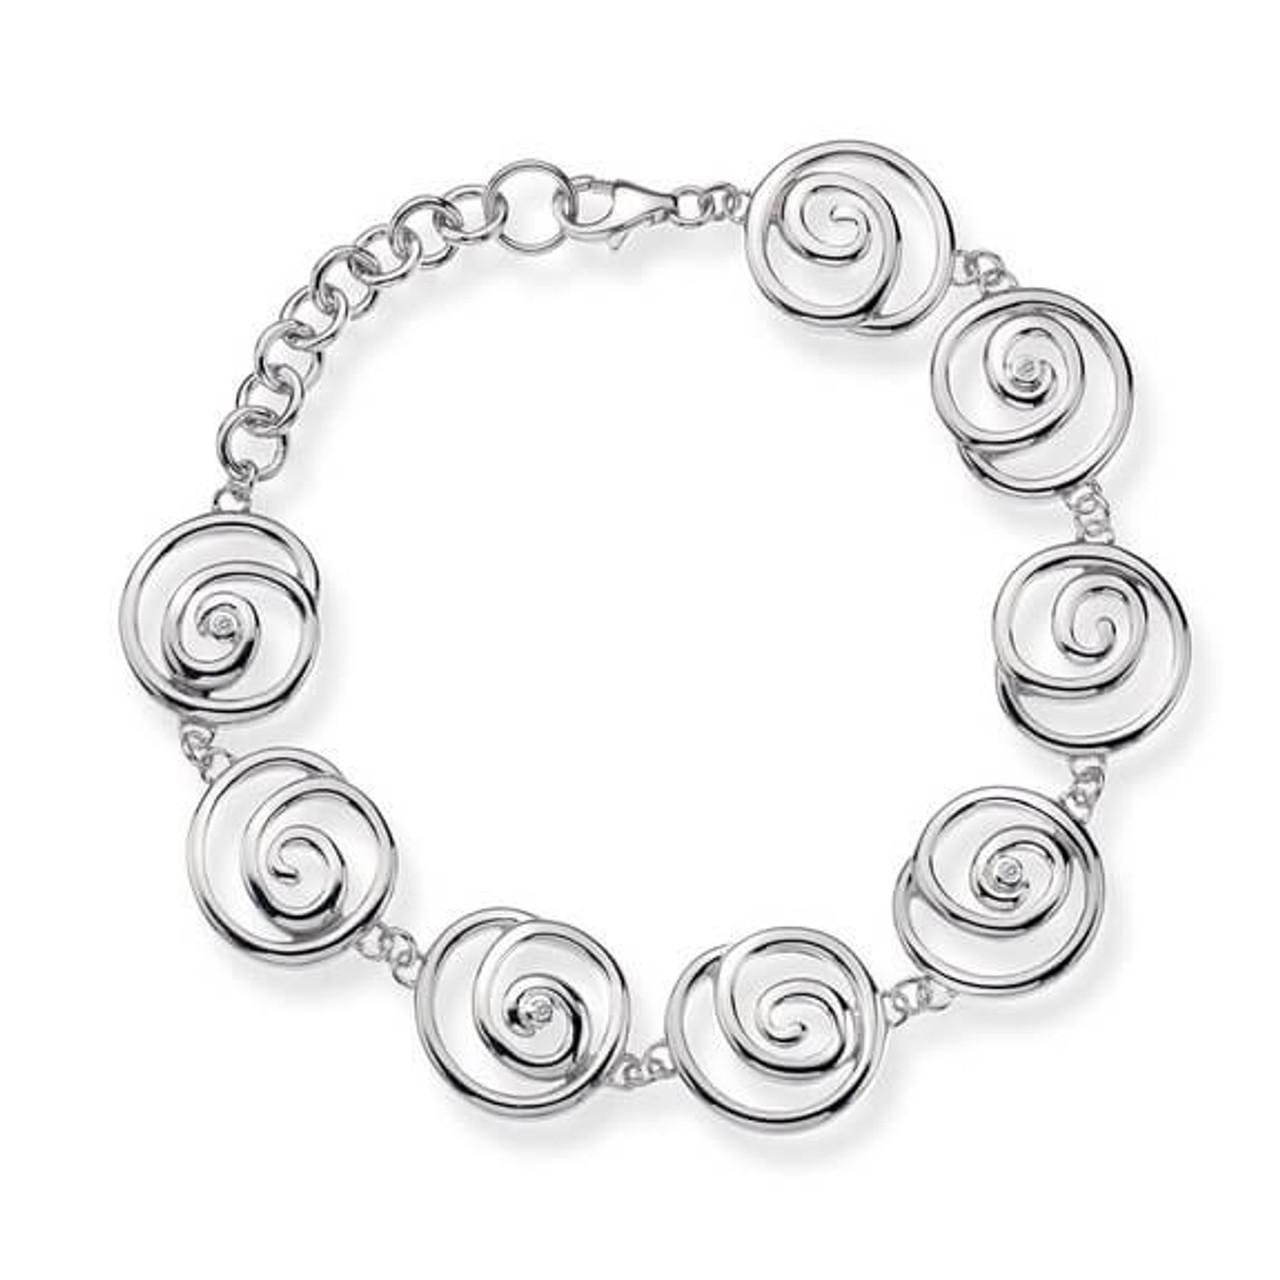 Hot Diamonds Eternity Spiral Bracelet of 19 cm wVvRE